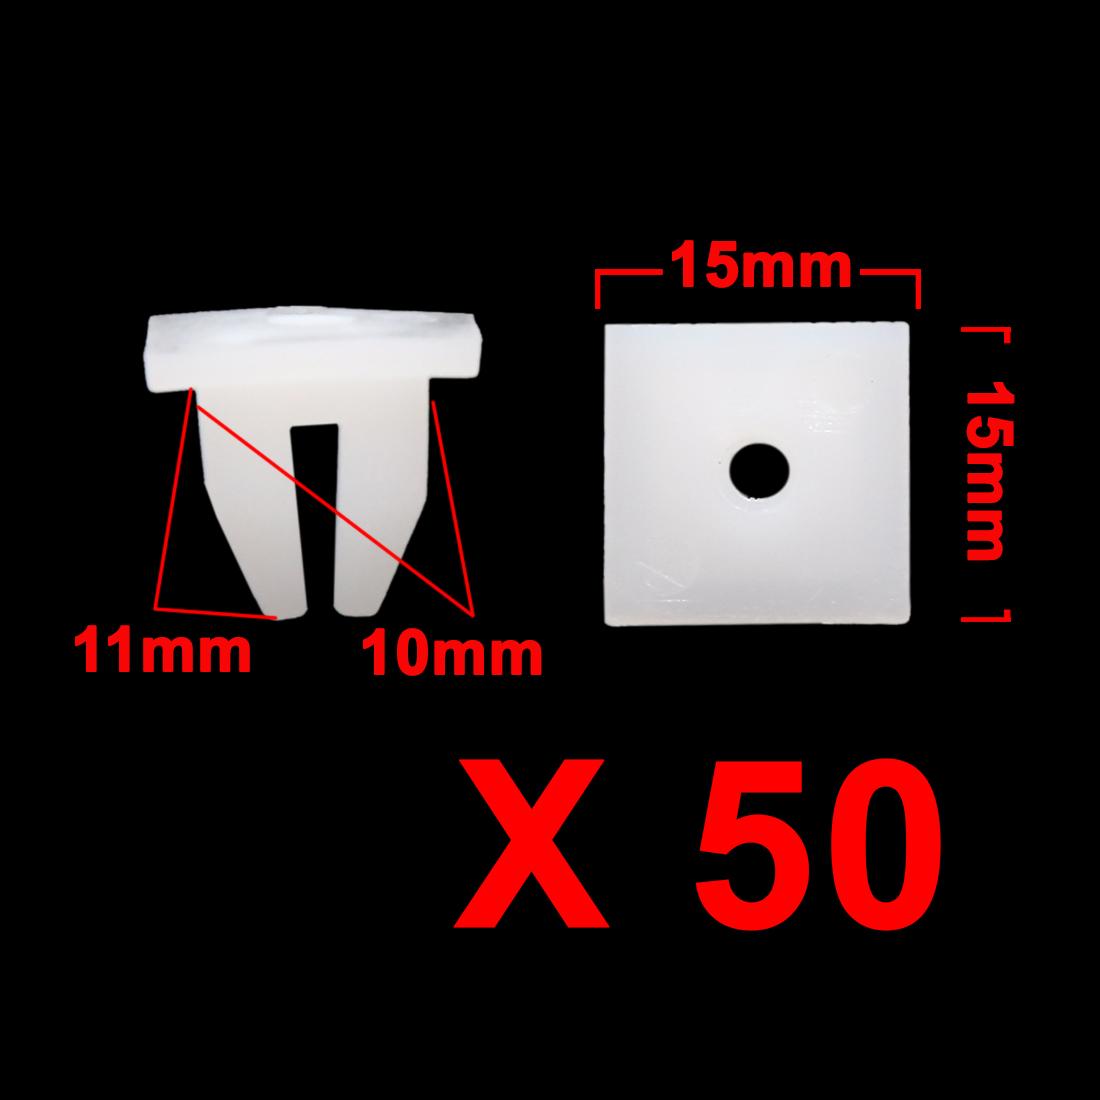 50Pcs-White-Plastic-Rivets-Bumper-Fender-Fastener-Retainers-Clips-10mm-for-Car